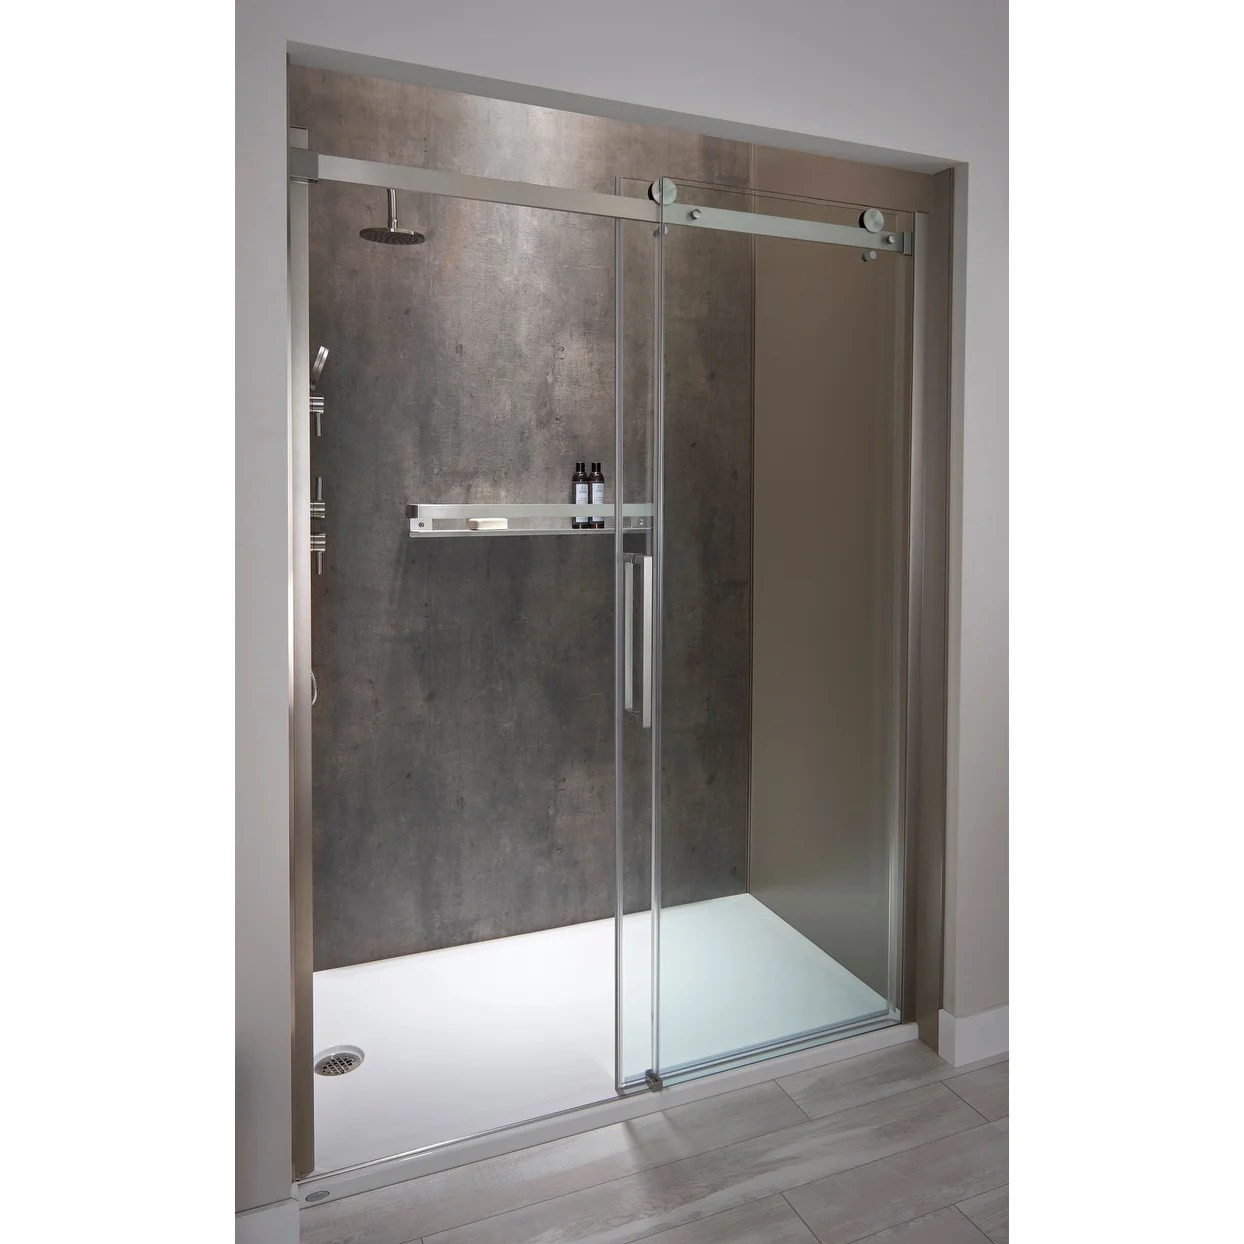 Jacuzzi Sx48 79 High X 48 Wide Sliding Semi Frameless Shower Door With Clear Glass